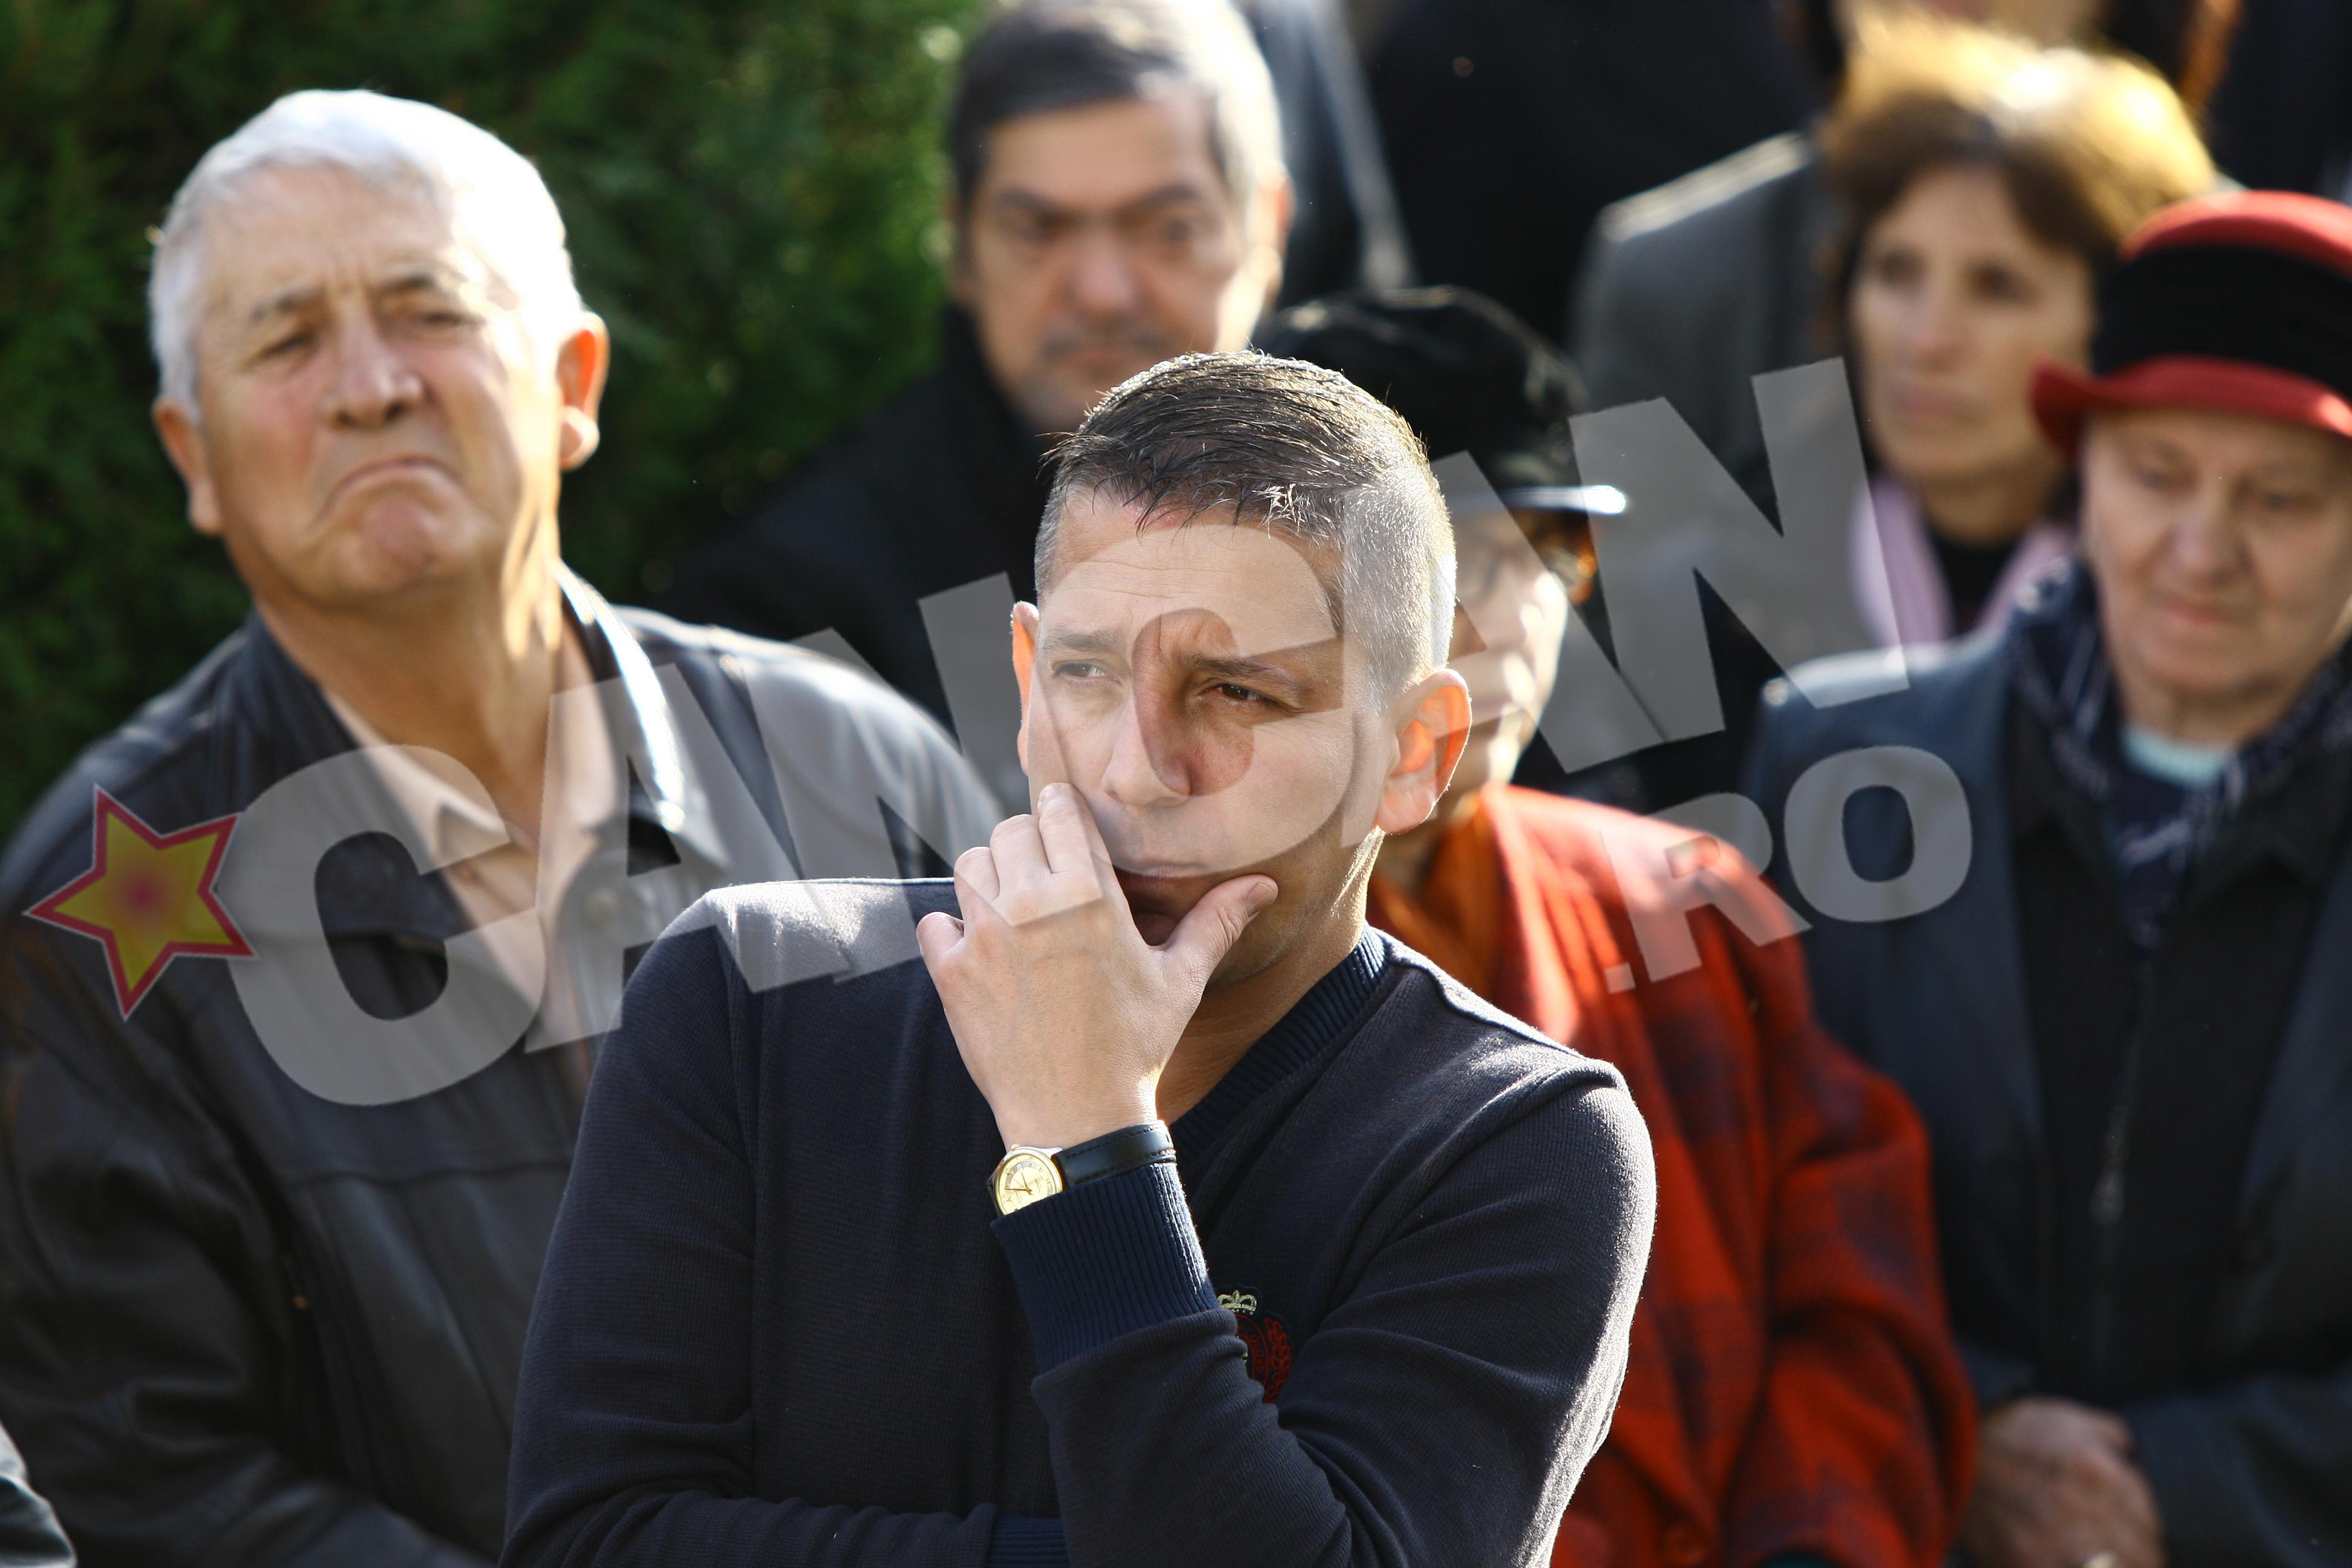 Costin Marculescu nu si-a dezlipit ochii de pe sicriul lui Iurie Darie